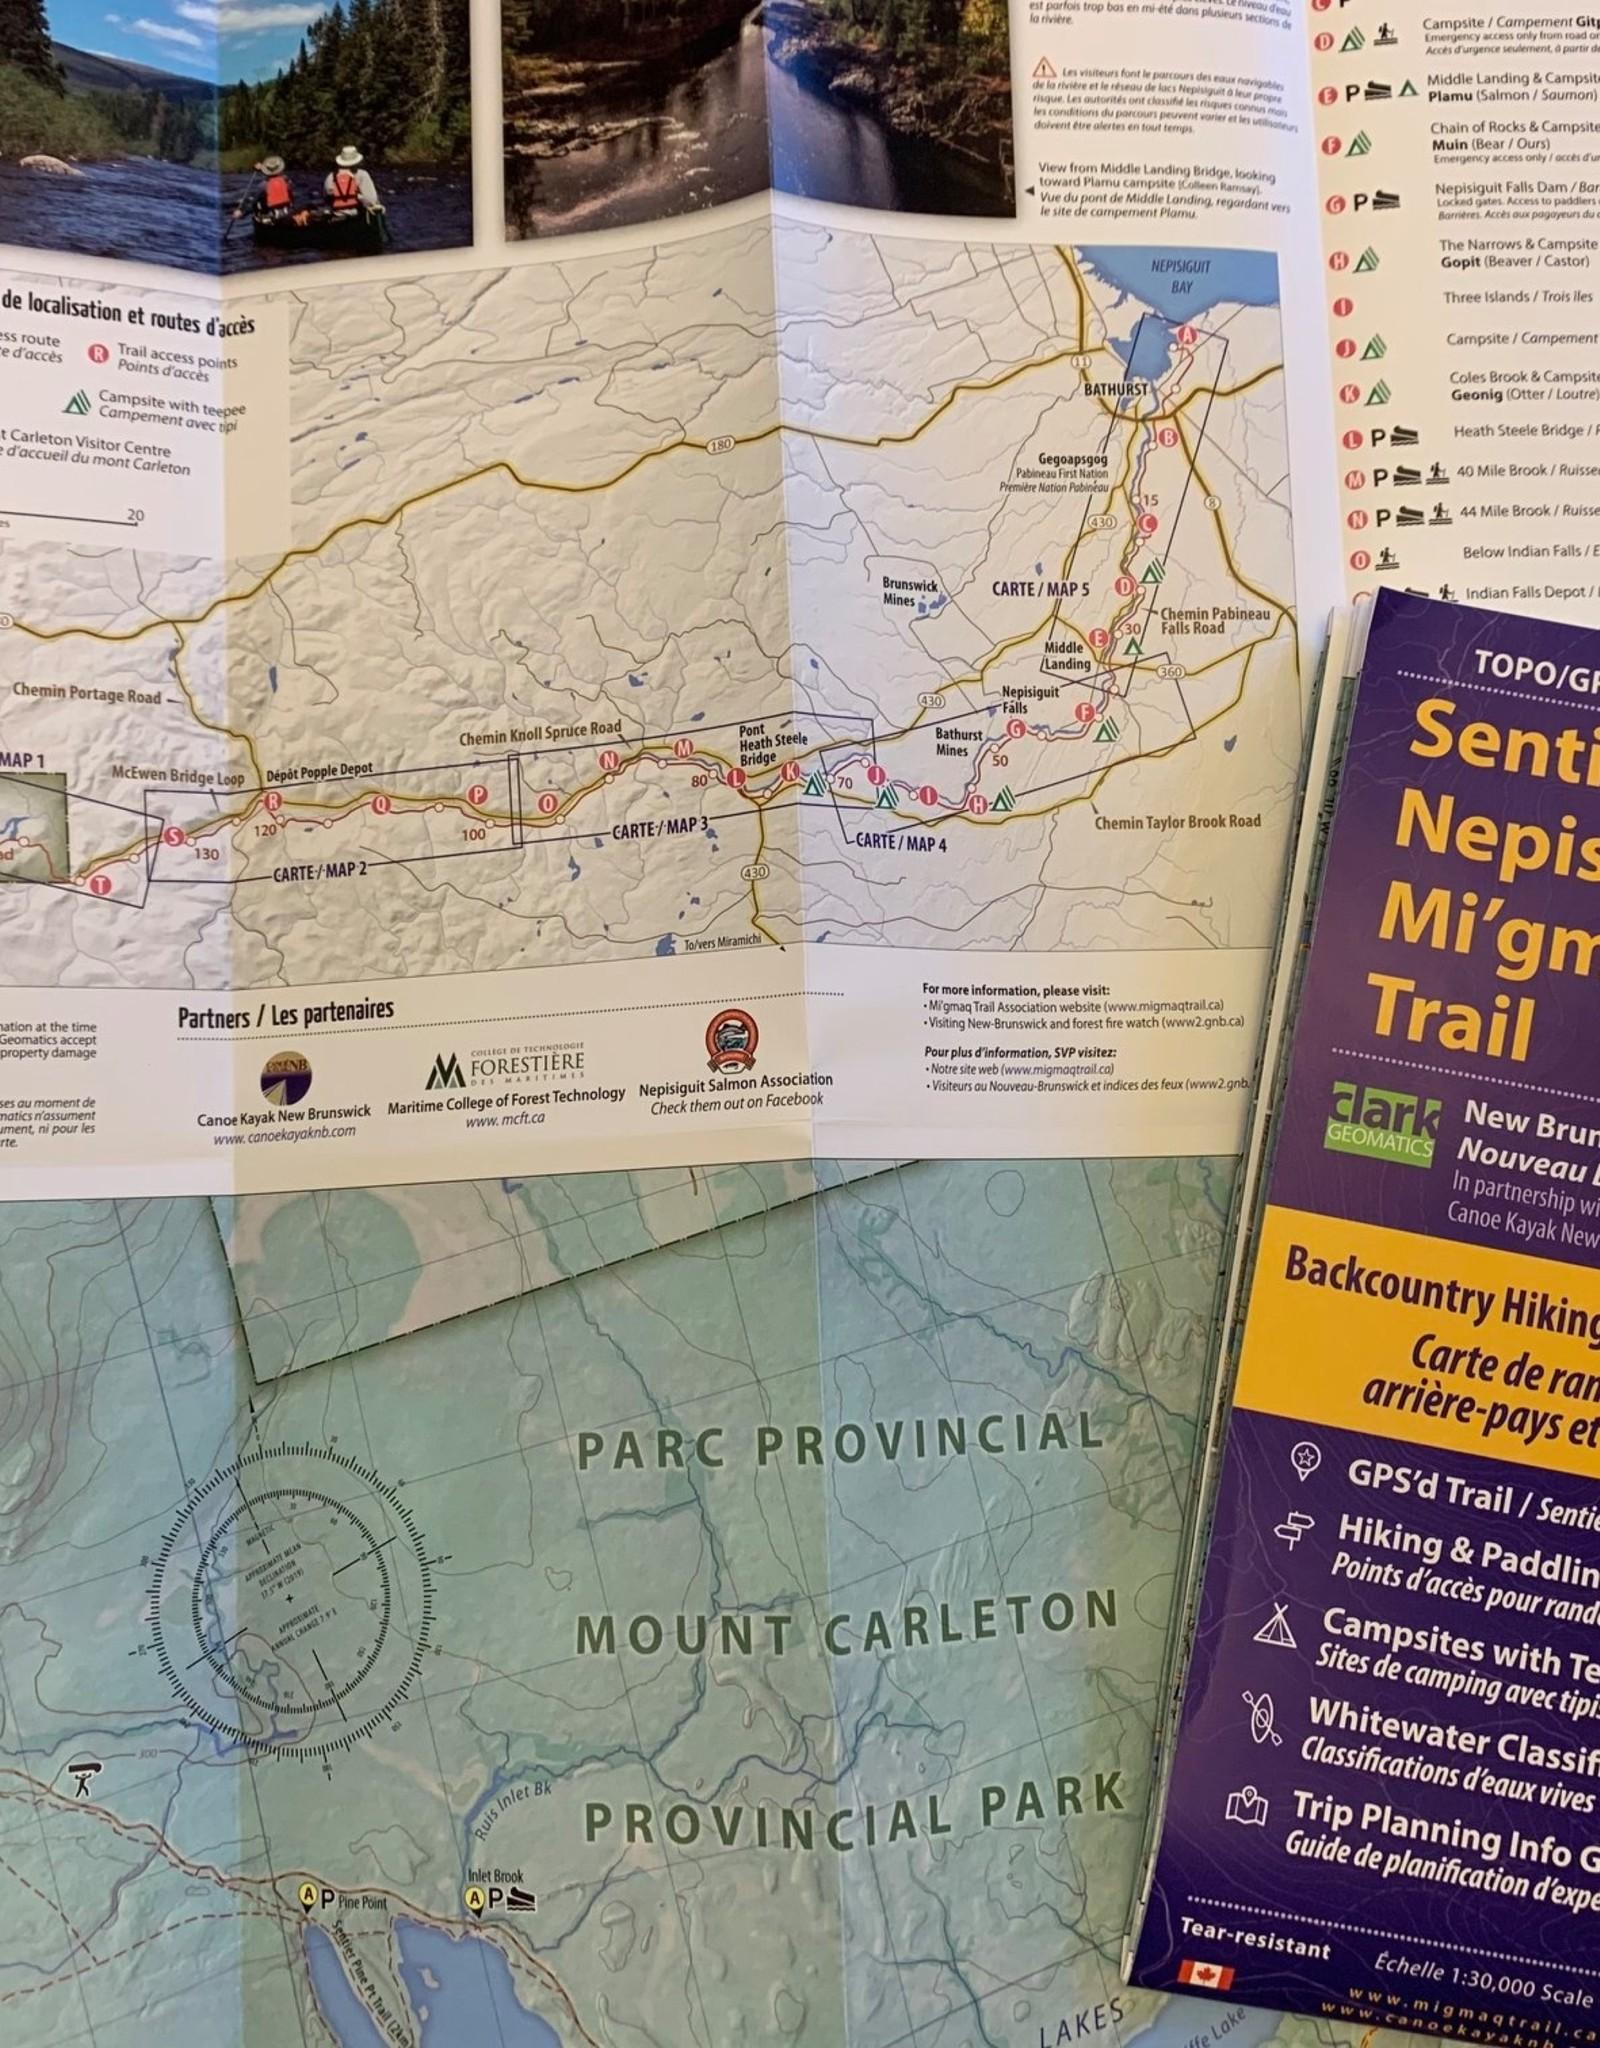 Sentier Nepisiguit Mi'gmag Trail Map